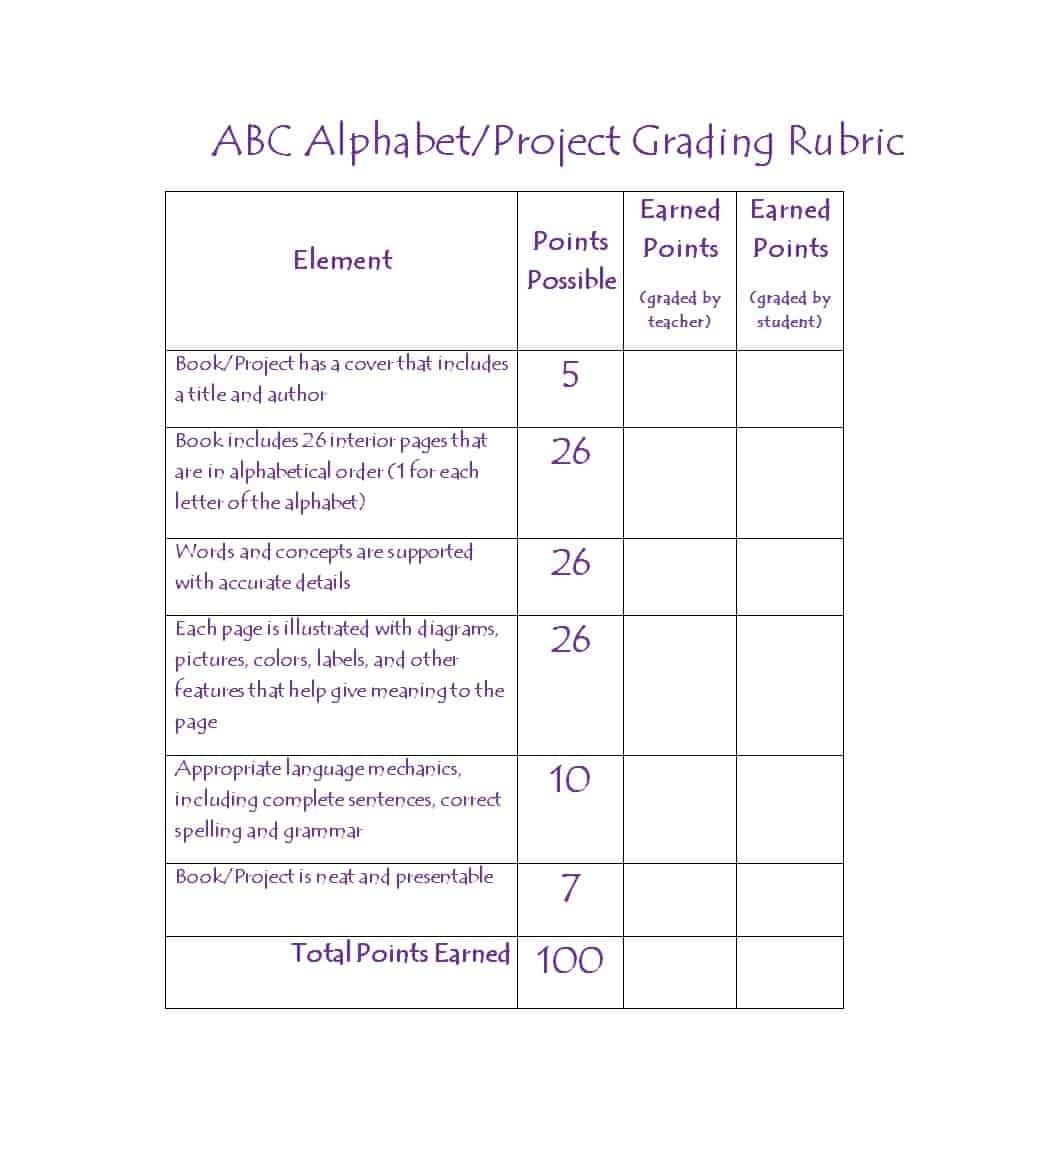 46 Editable Rubric Templates (Word Format) ᐅ Template Lab - Free Printable Blank Rubrics